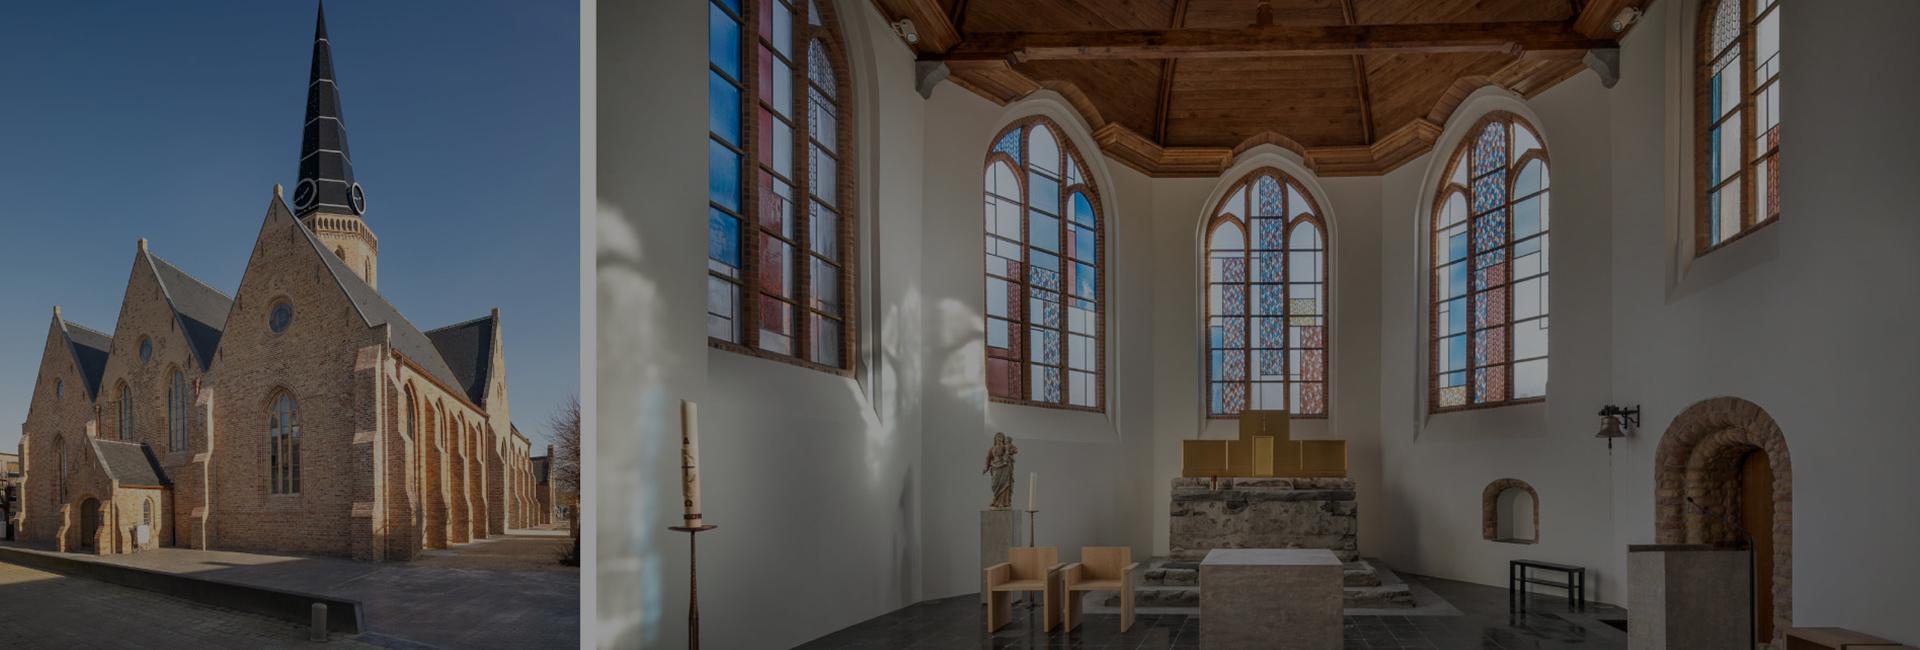 Heropgebouwde kerk, nieuwe glasramen in Westkapelle!